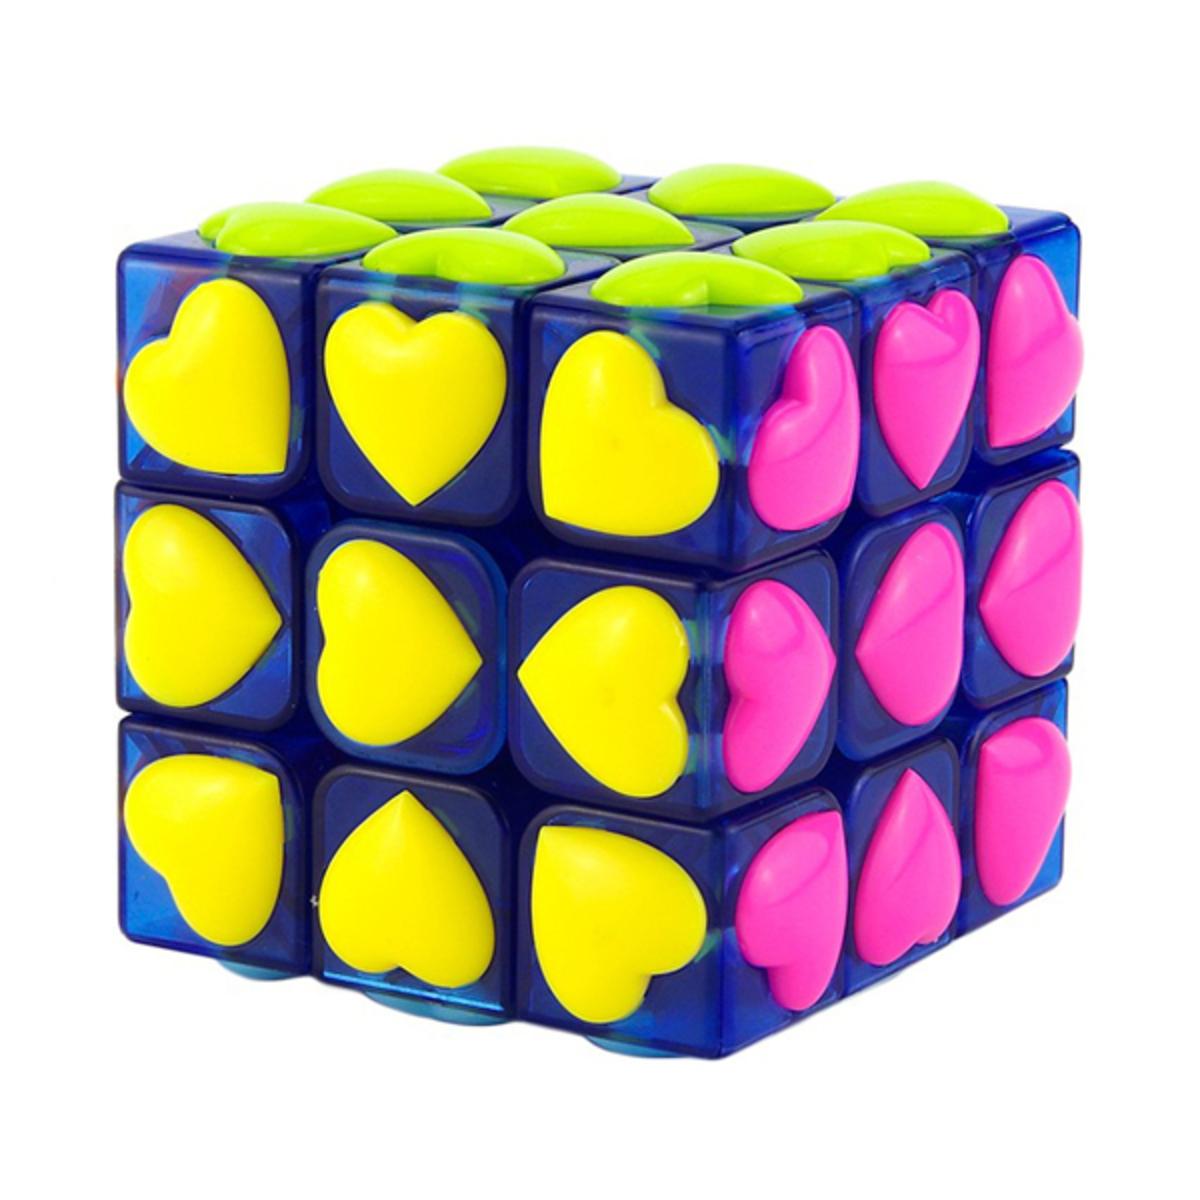 3x3x3 Love